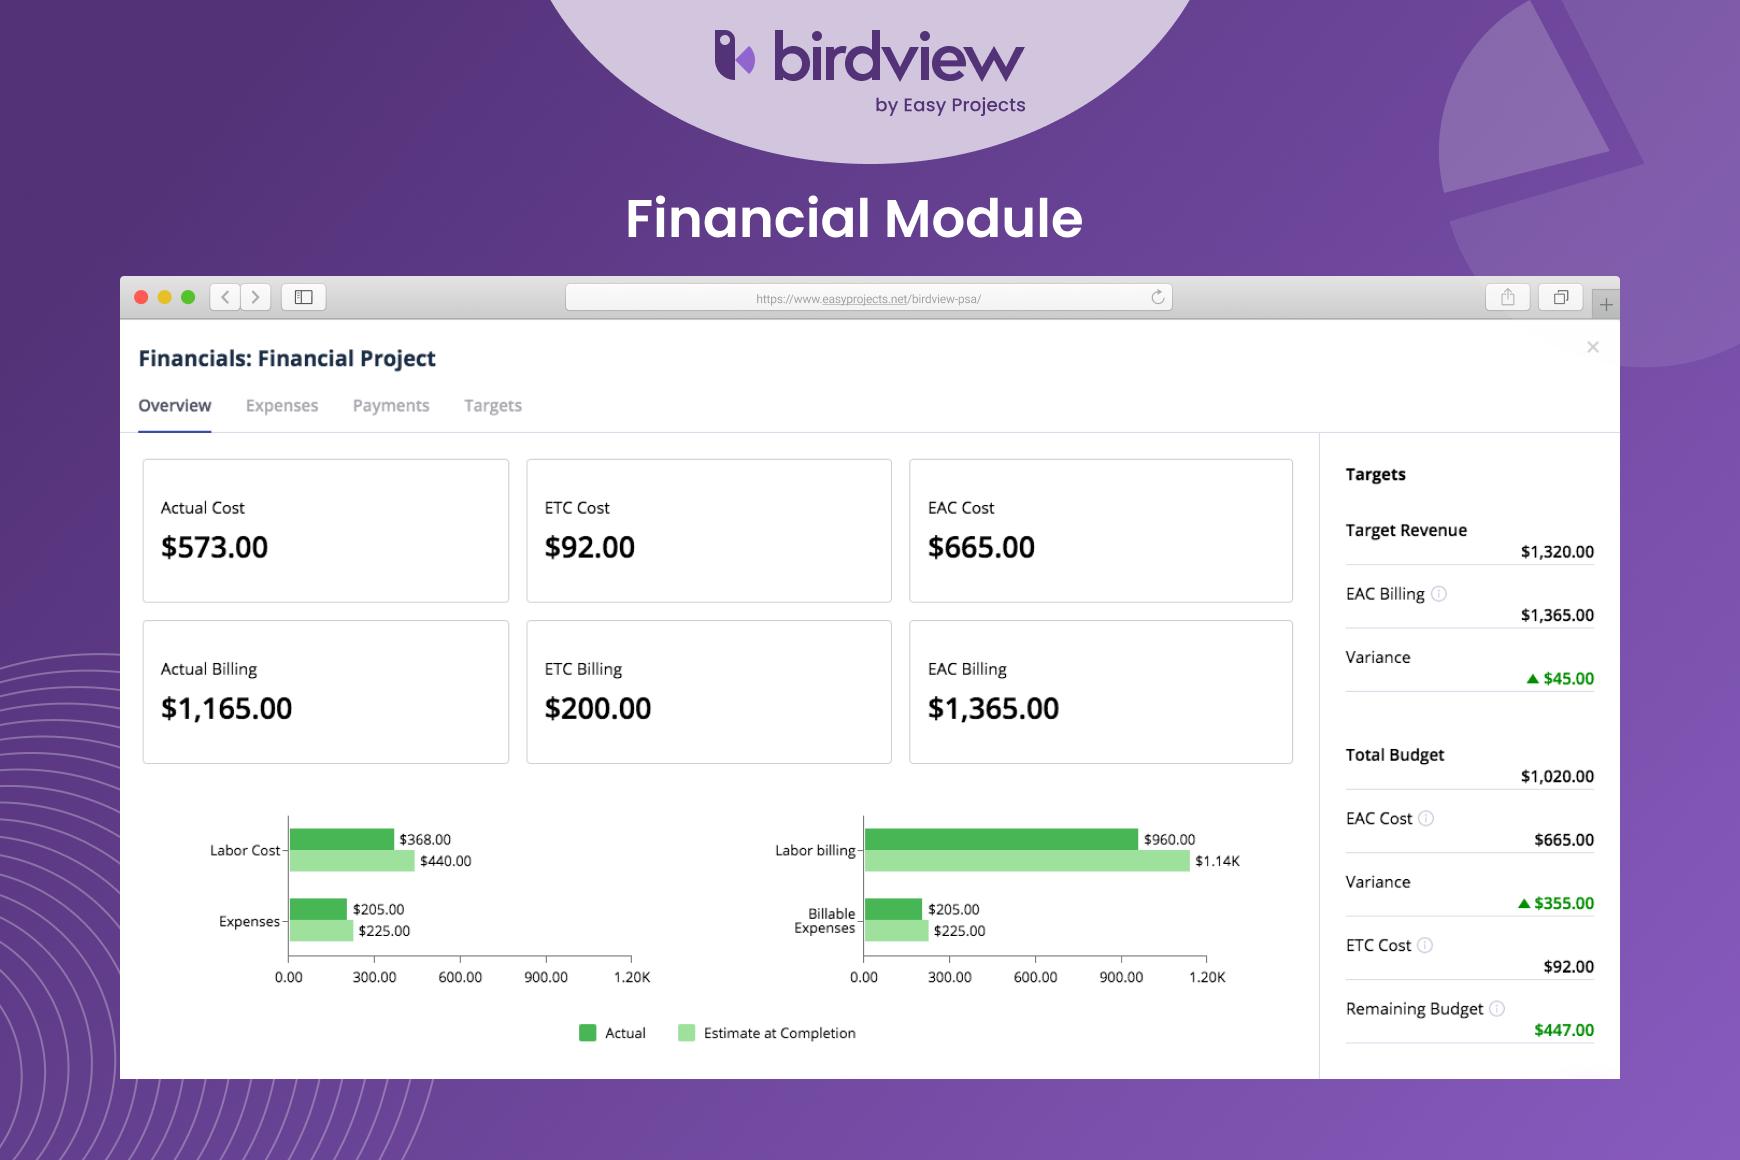 Birdview PSA - Financial Module